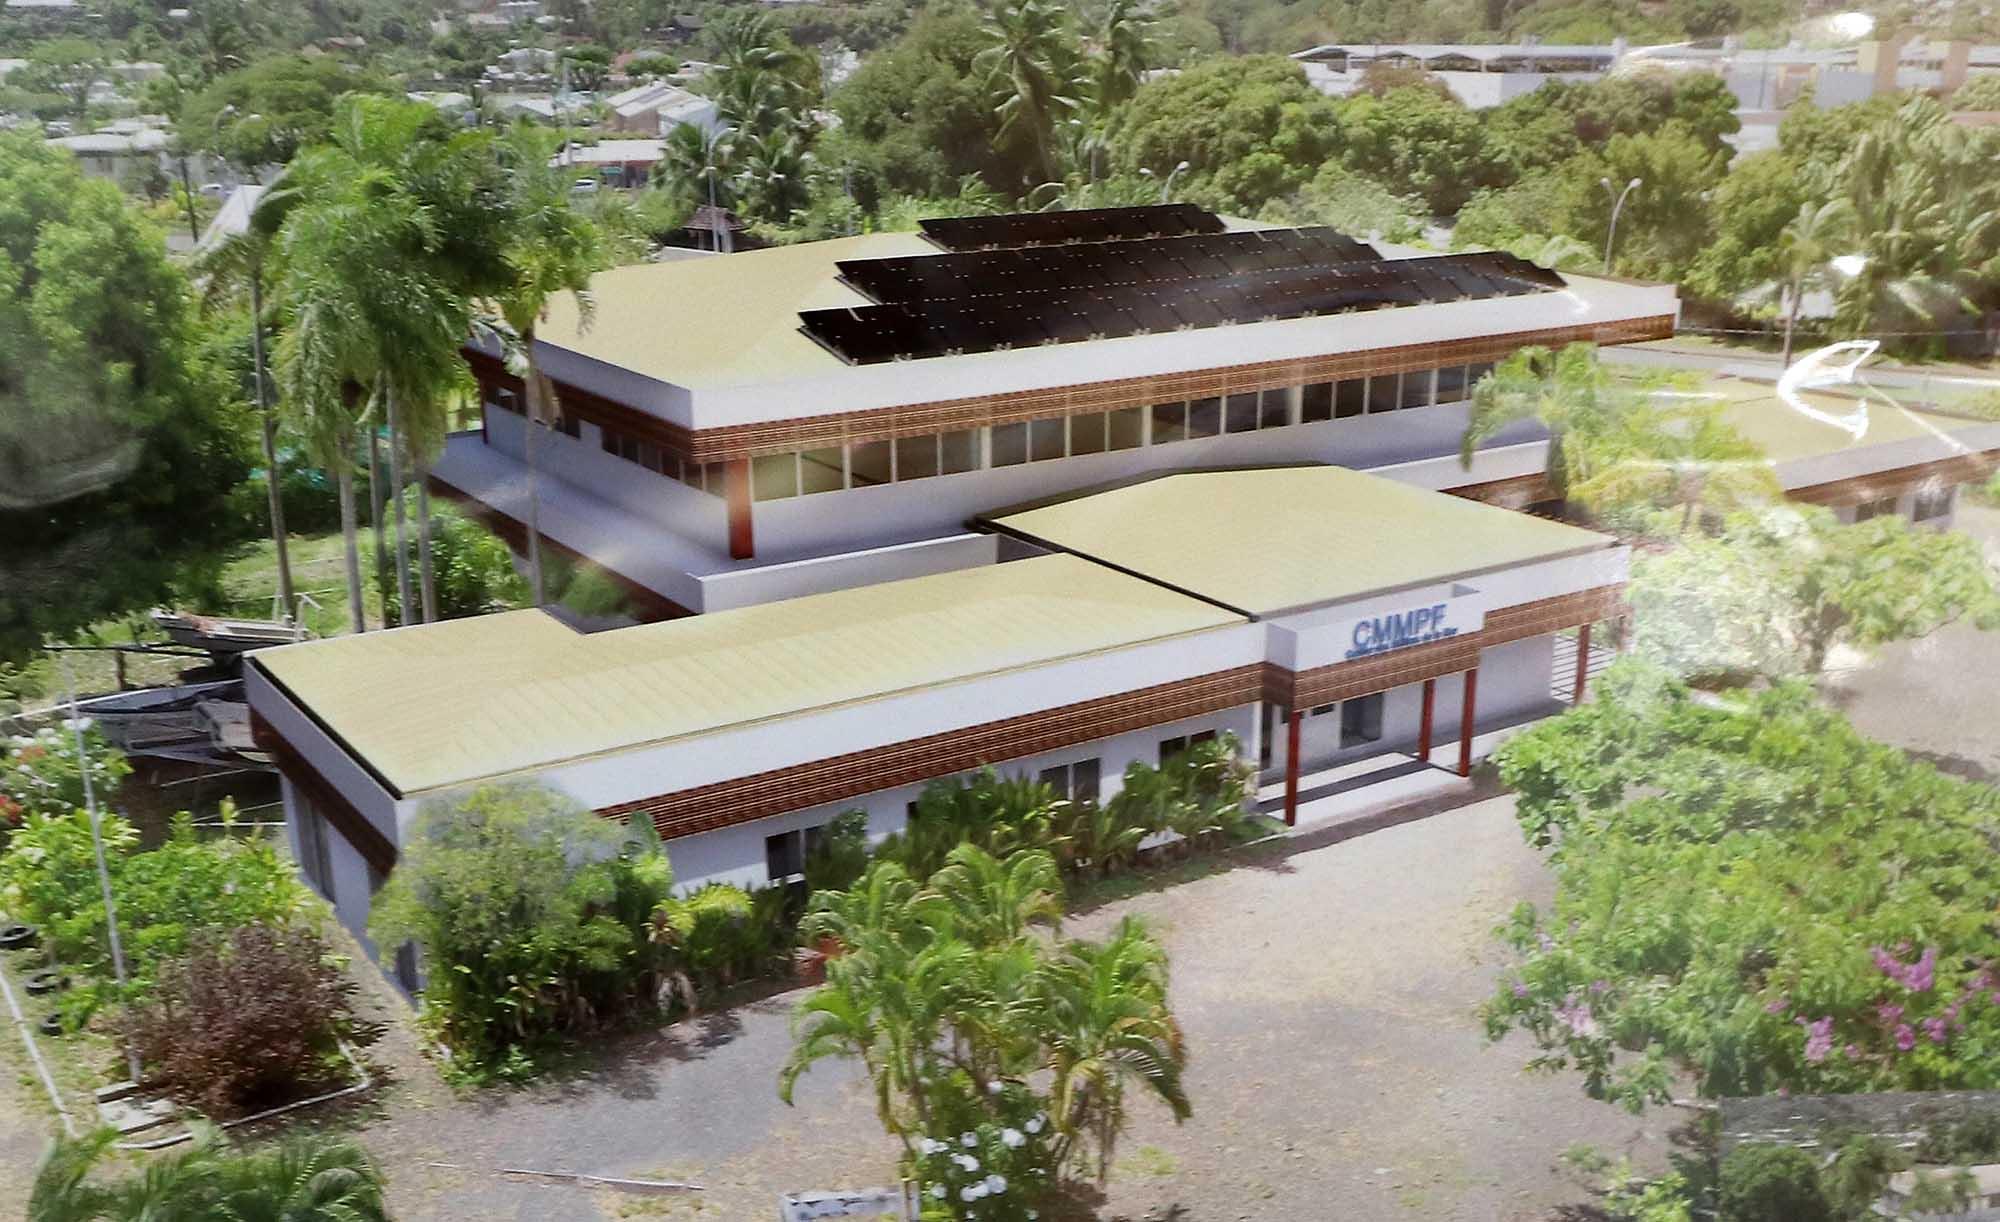 Un campus des métiers de la mer à Arue en 2020